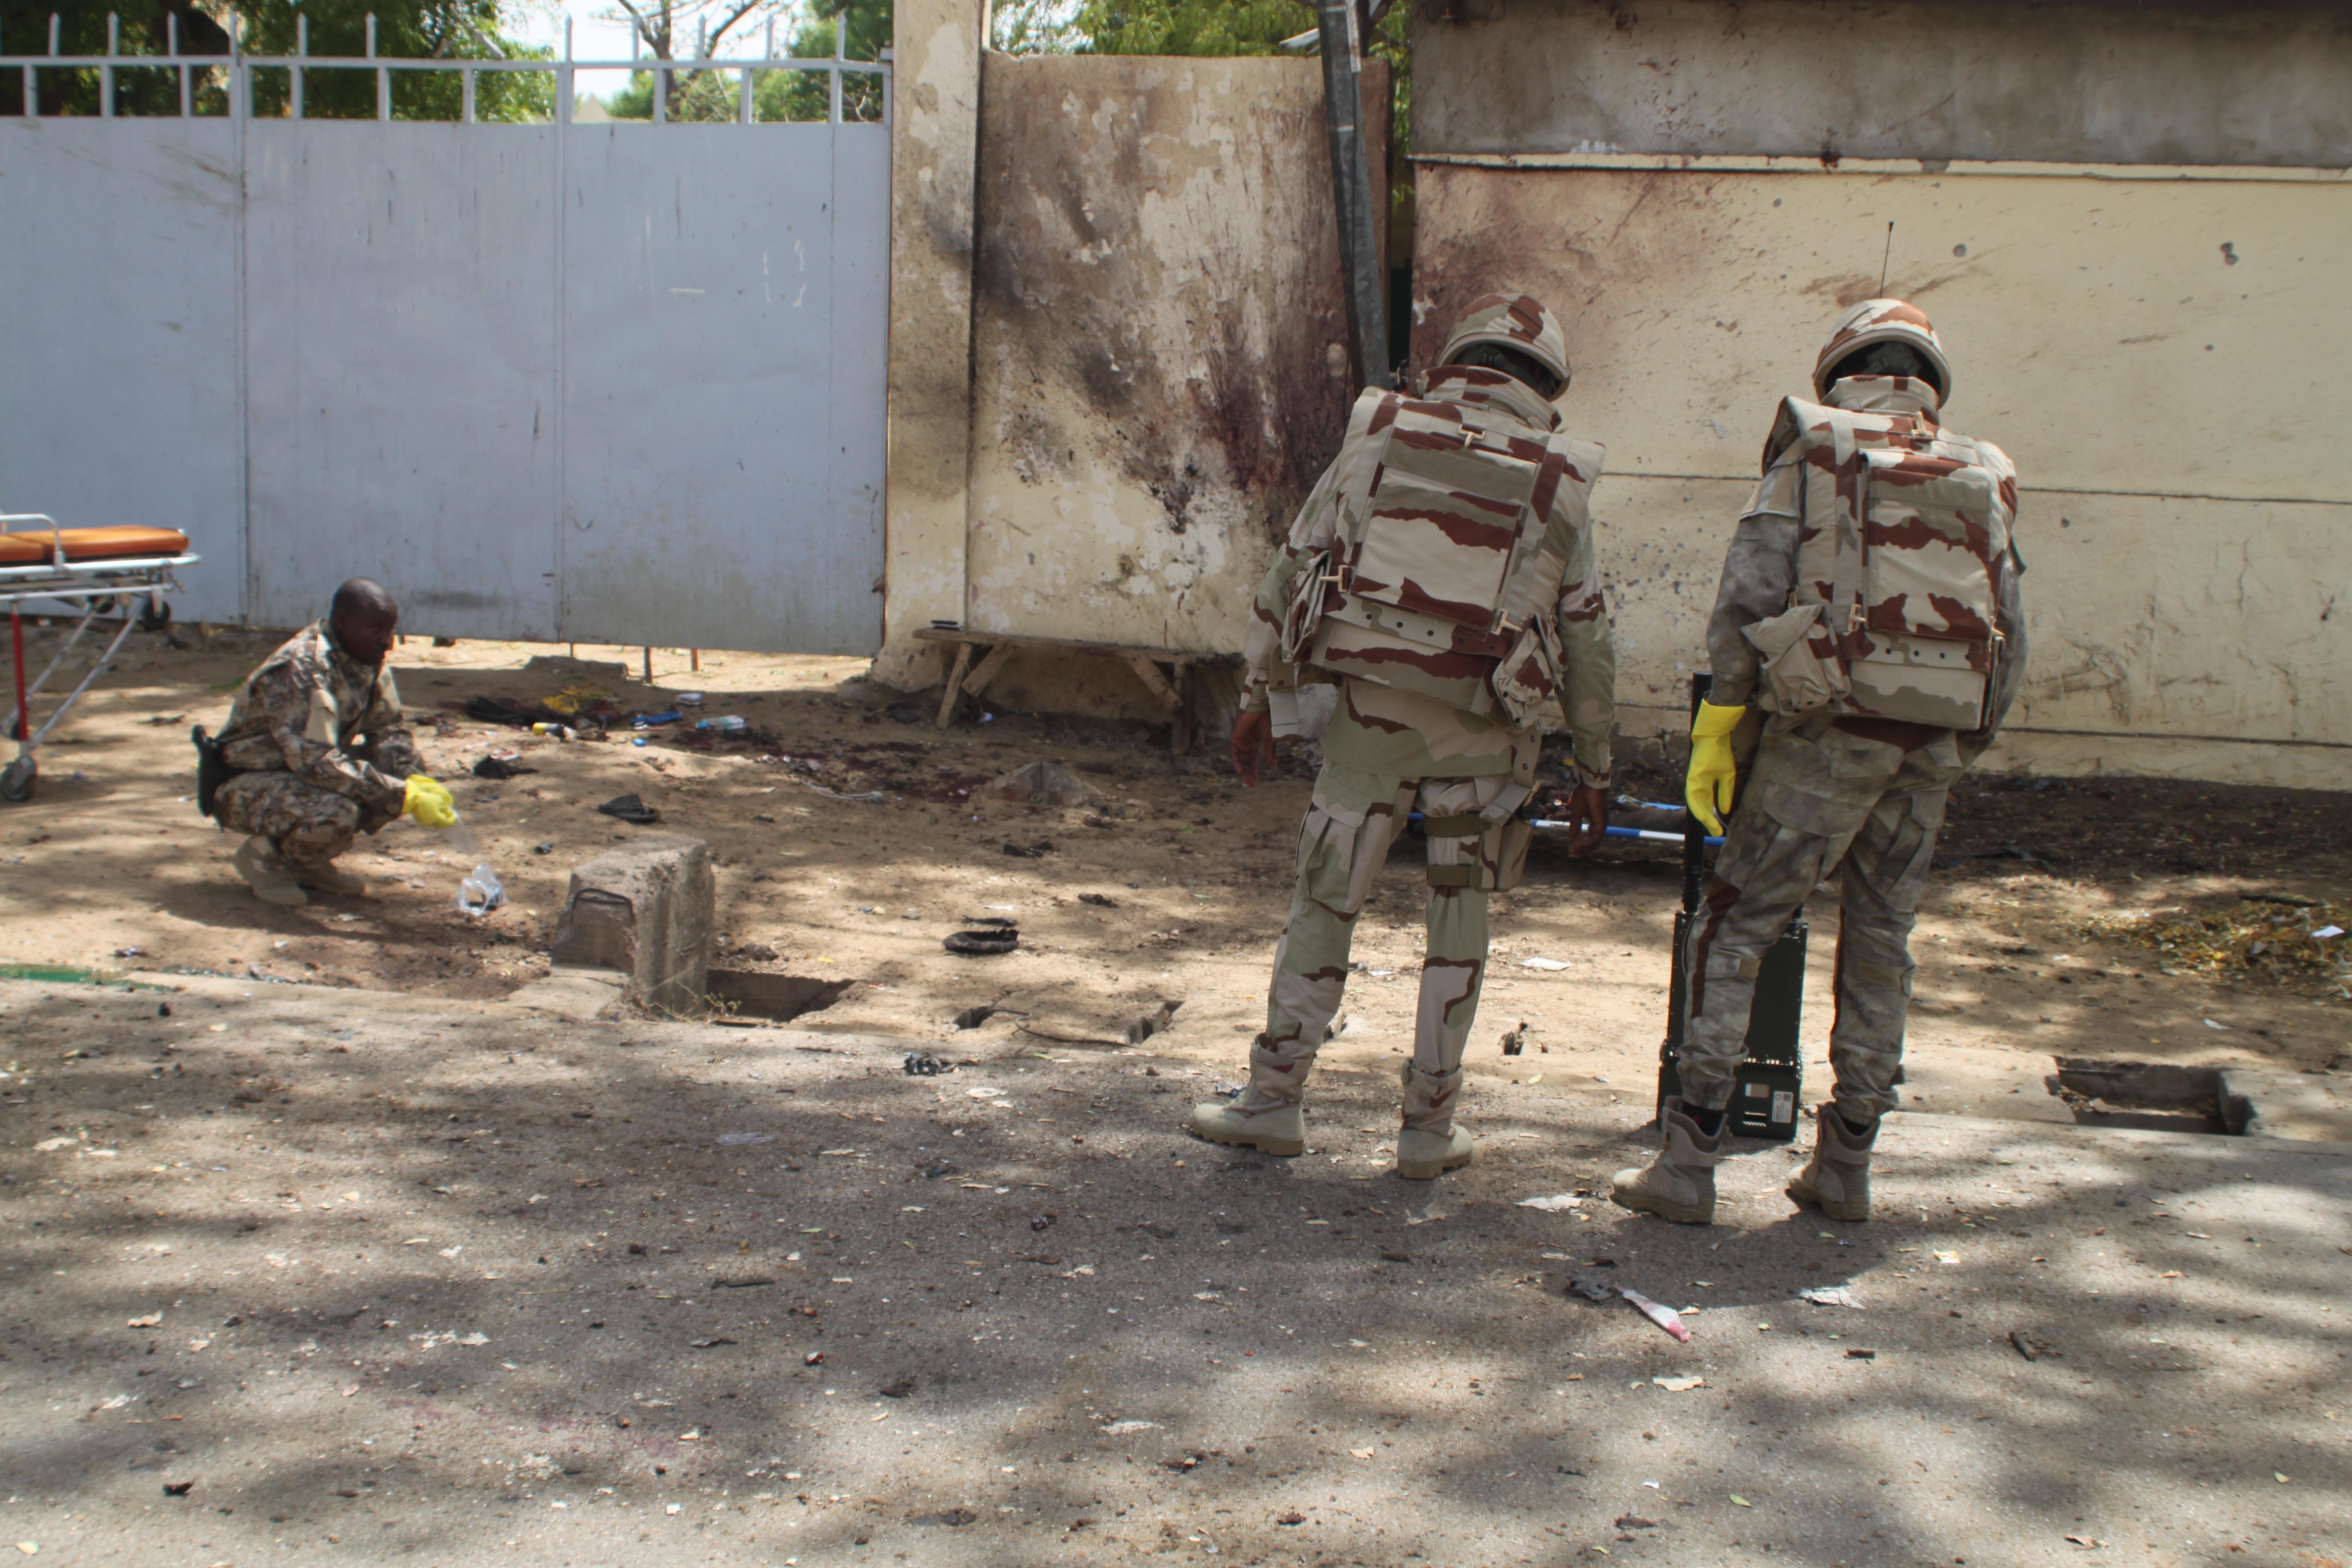 Attentats Tchad : le gouvernement promet de neutraliser les djihadistes